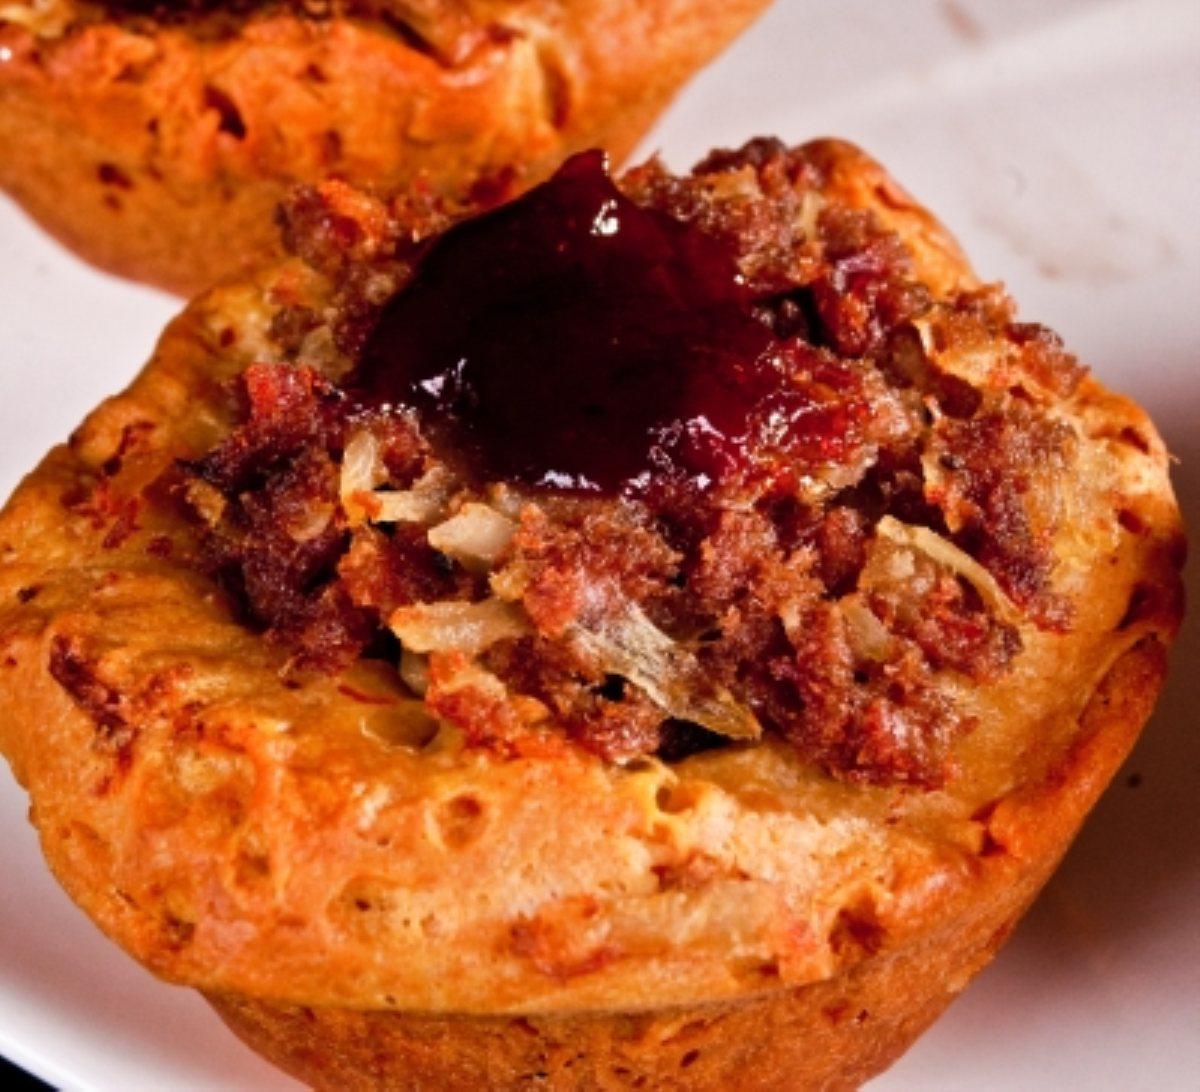 ... Course Bread Biscuits and Scones Corned Beef Breakfast Biscuits